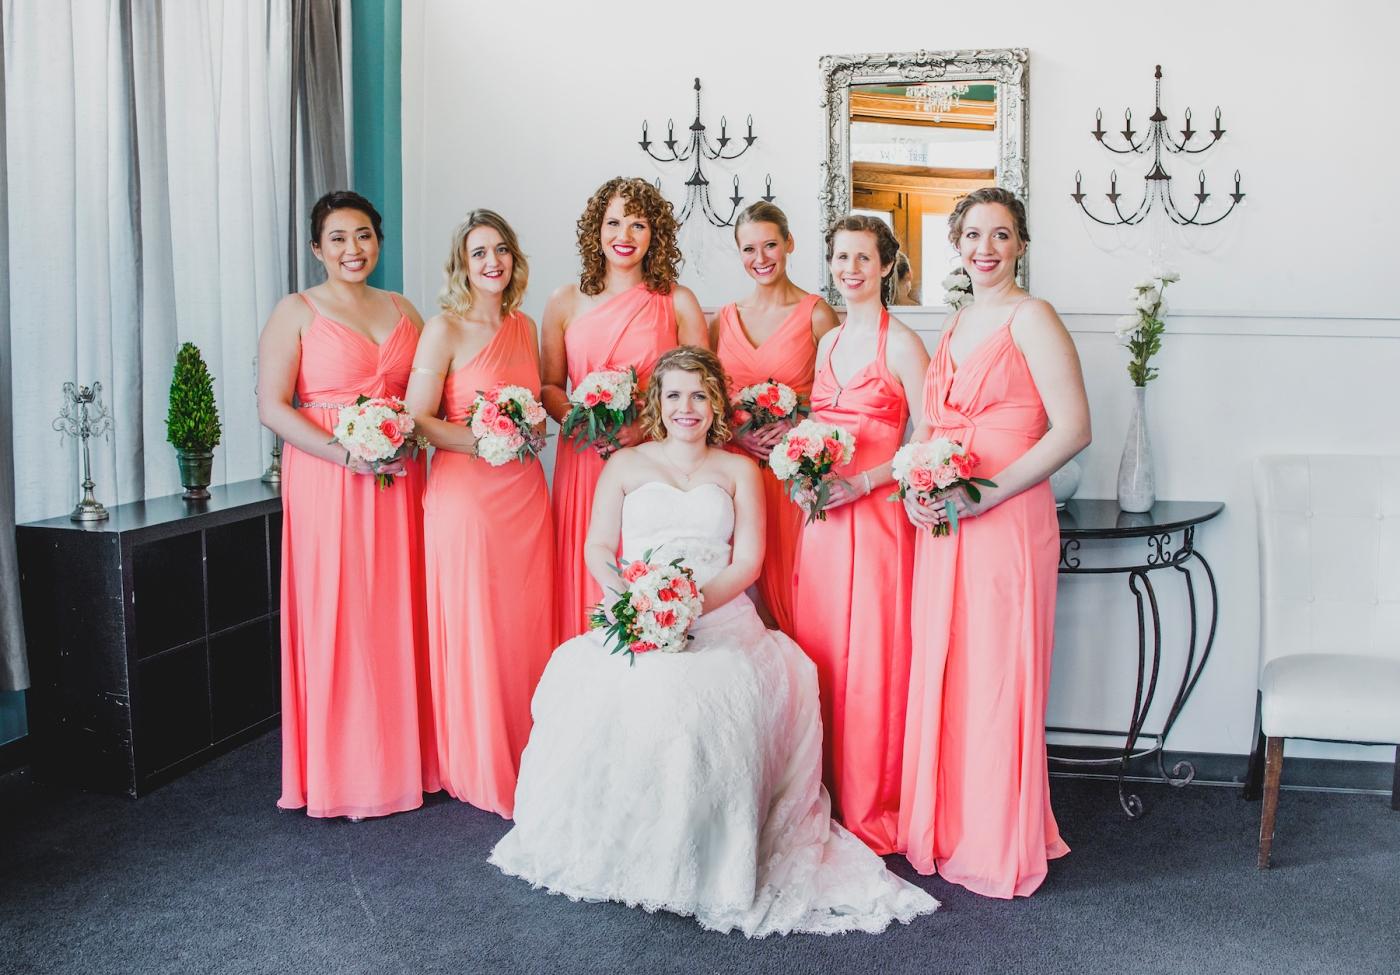 DSC_2434Everett_Wedding_Ballroom_Jane_Speleers_photography_Rachel_and_Edmund_Praying_2017